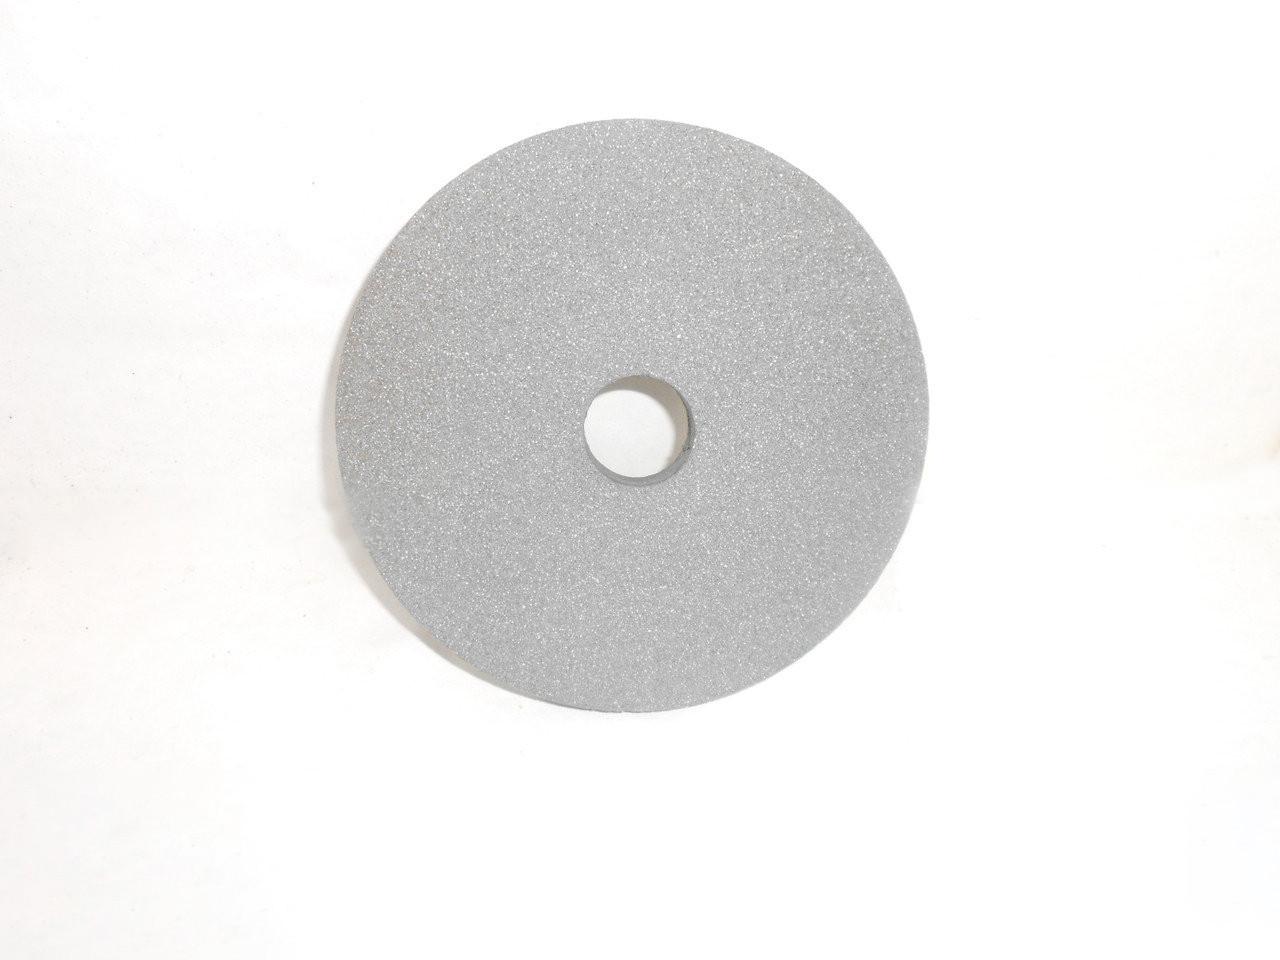 Круг шлифовальный 14А ПП 350х13х127  25-40 СМ